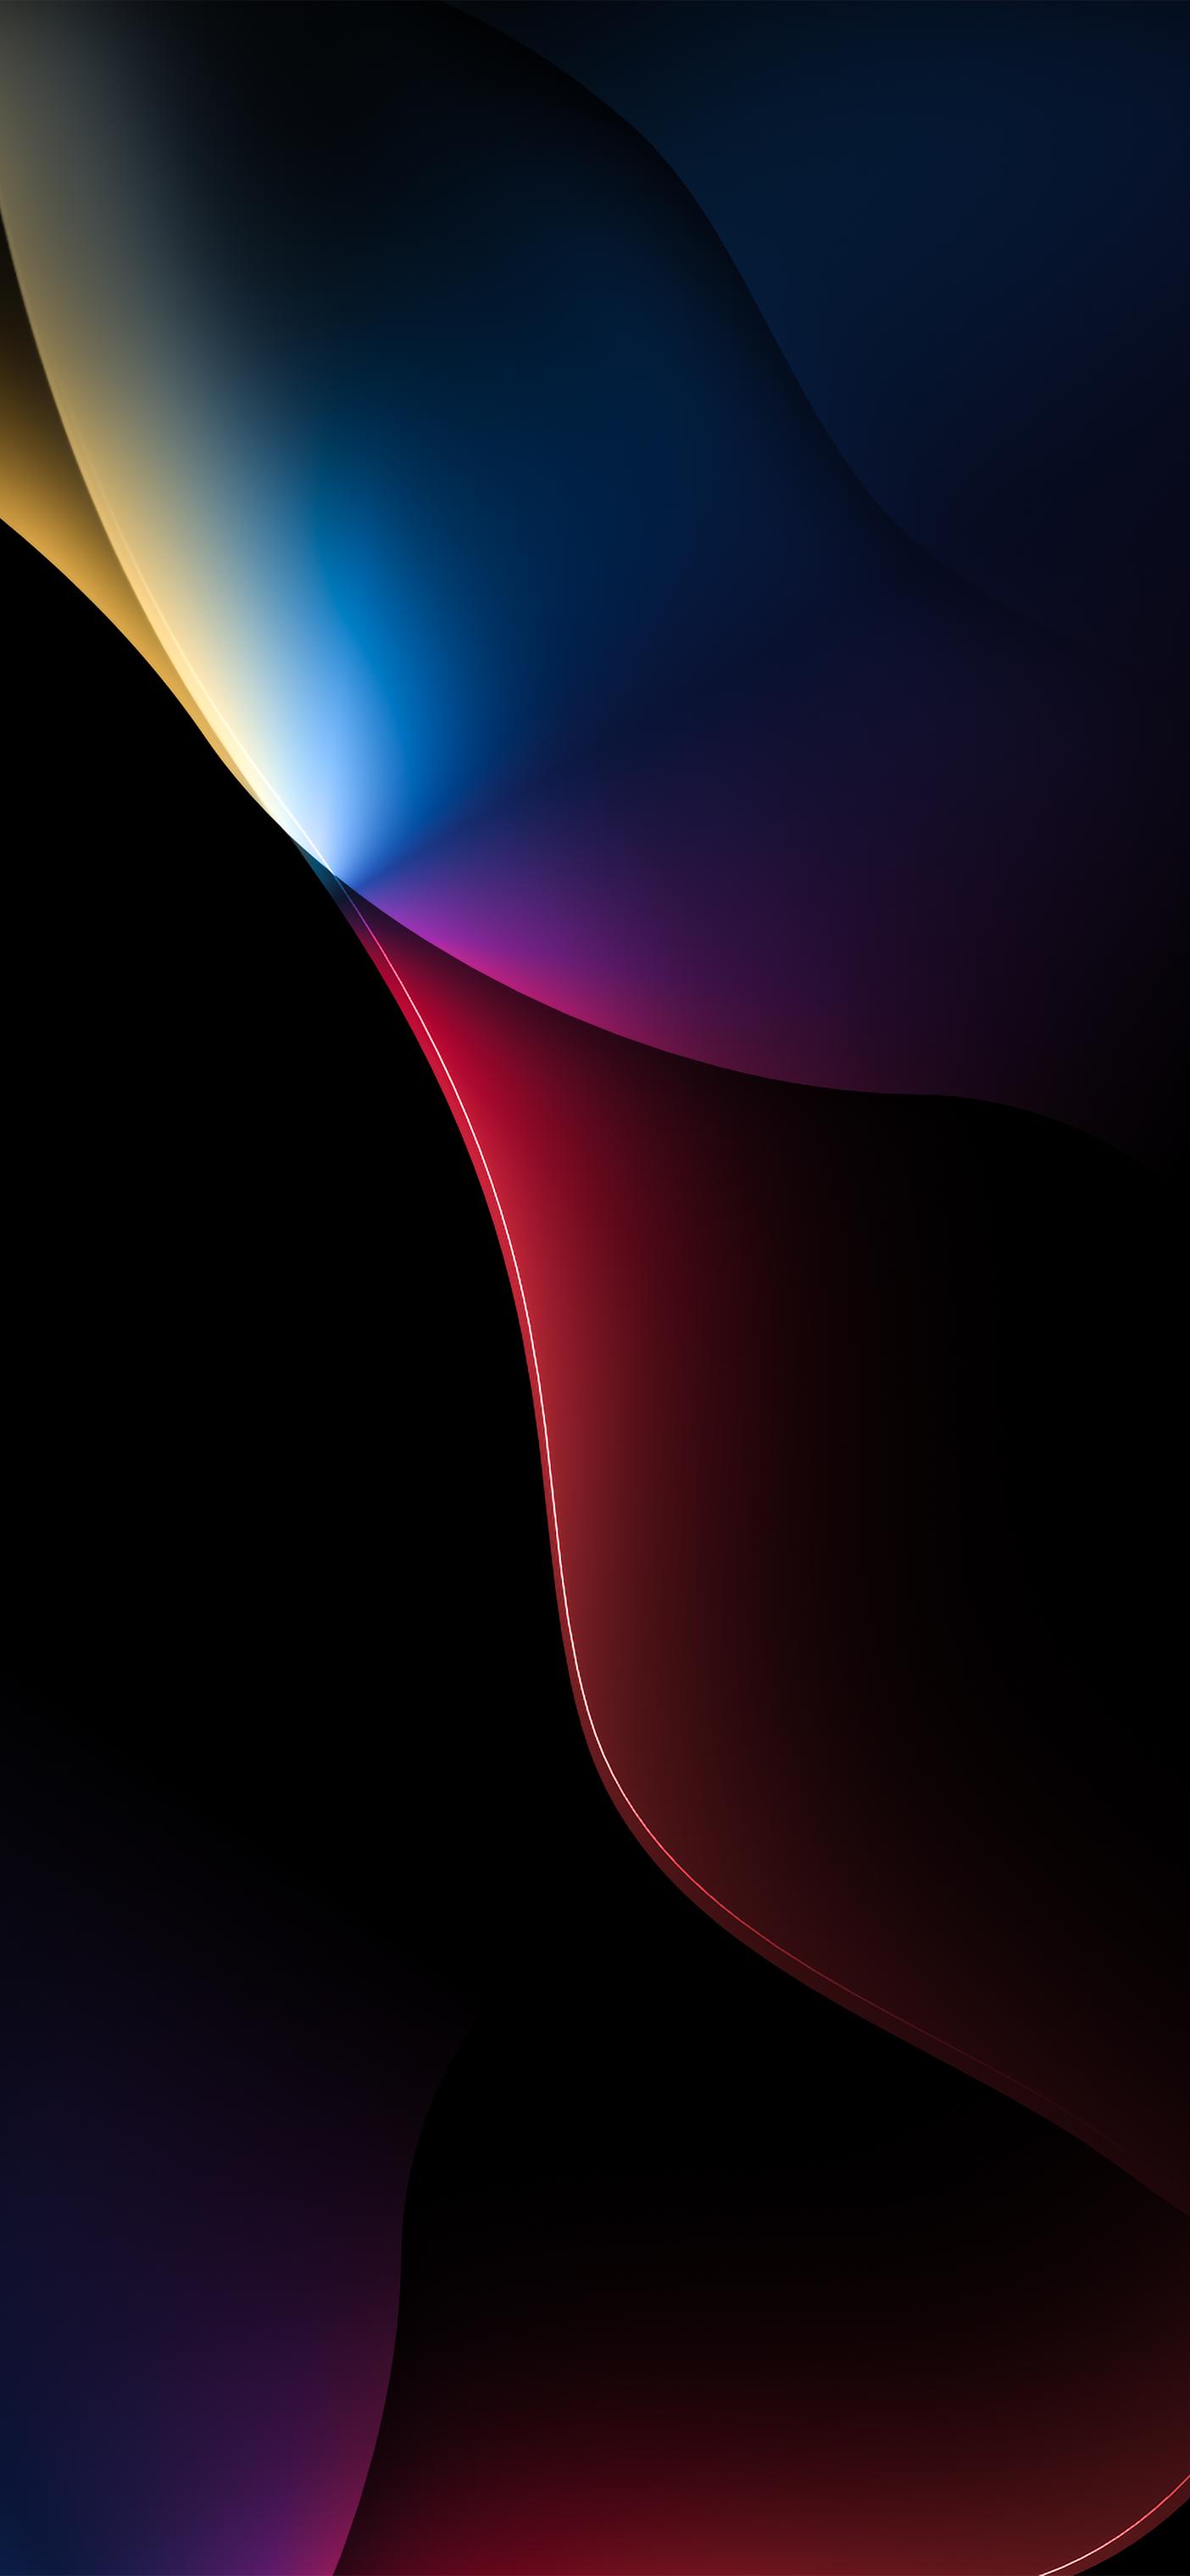 dark mode wallpaper iPhone by Hk21ToN   Zollotech